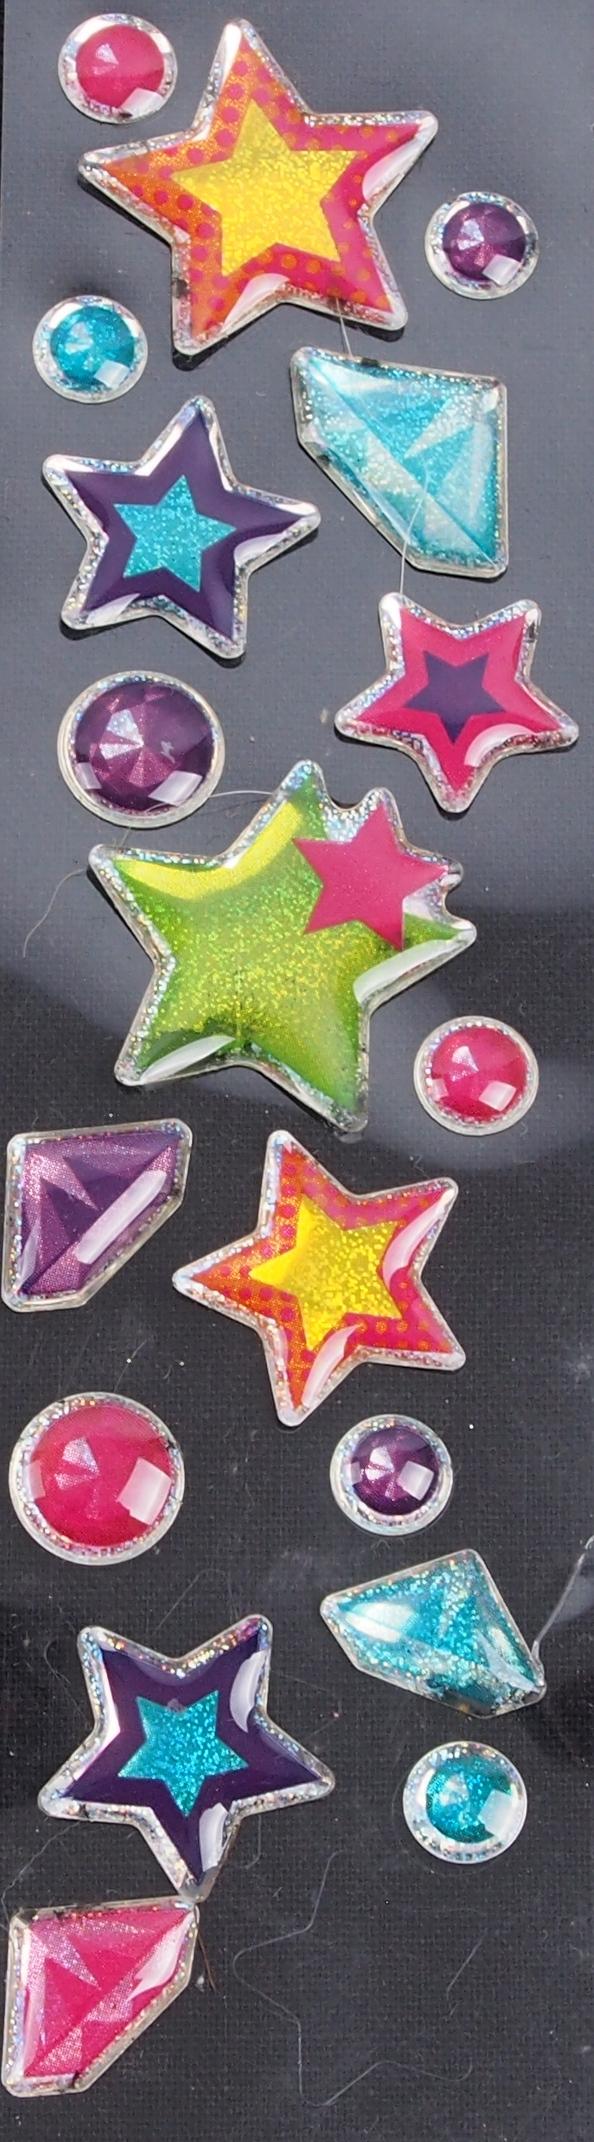 Kunststoffsticker Sterne